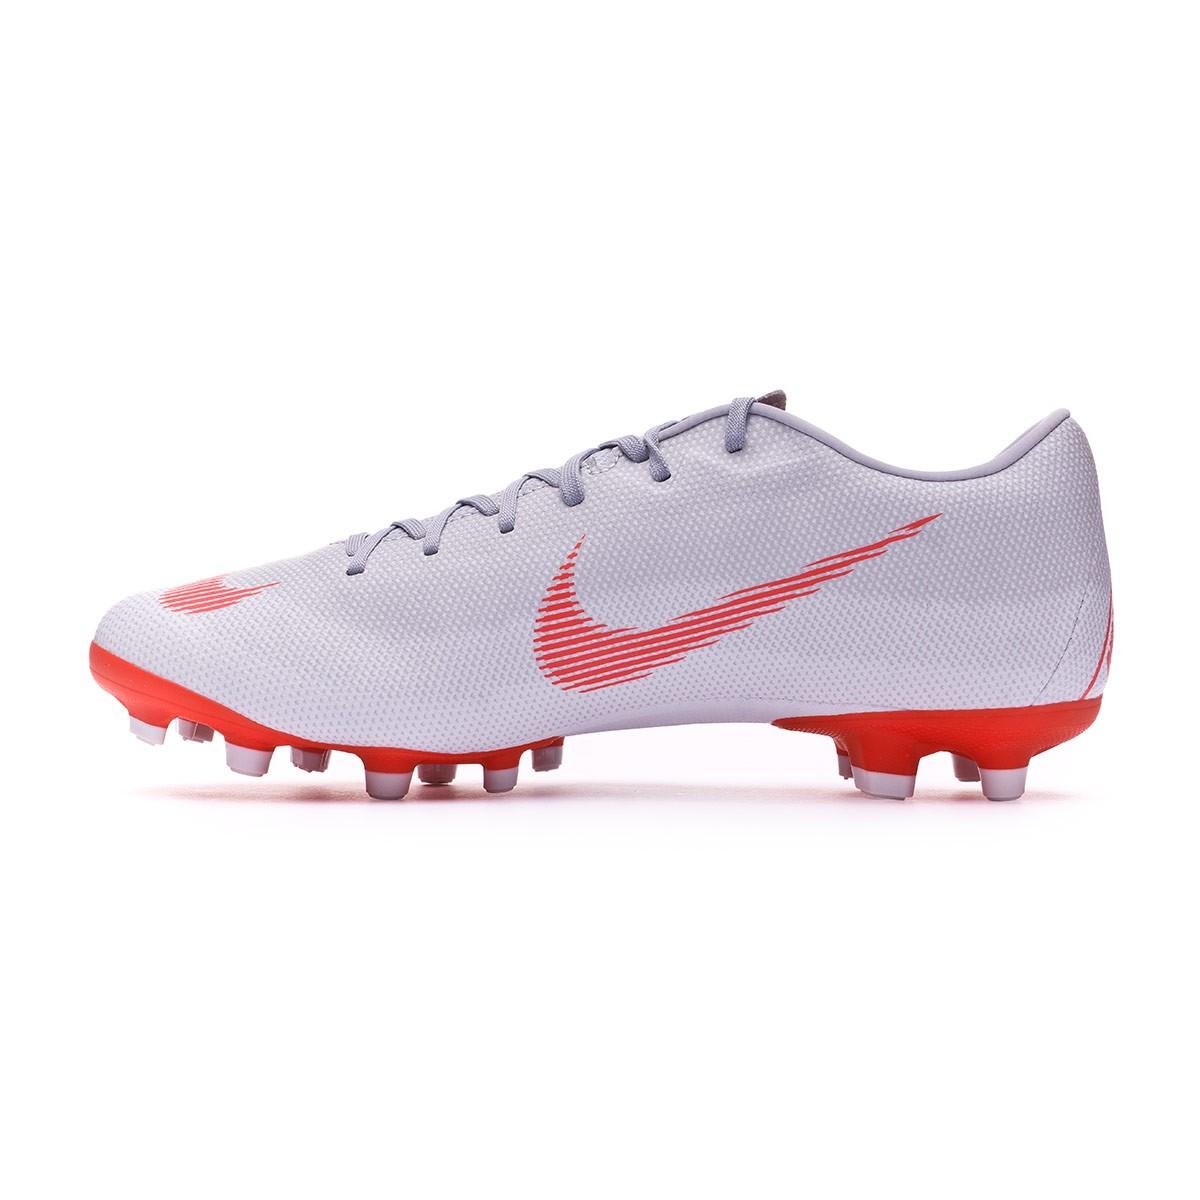 11ea4d48b Chuteira Nike Mercurial Vapor XII Academy MG Wolf grey-Bright crimson-Pure  platinum - Loja de futebol Fútbol Emotion